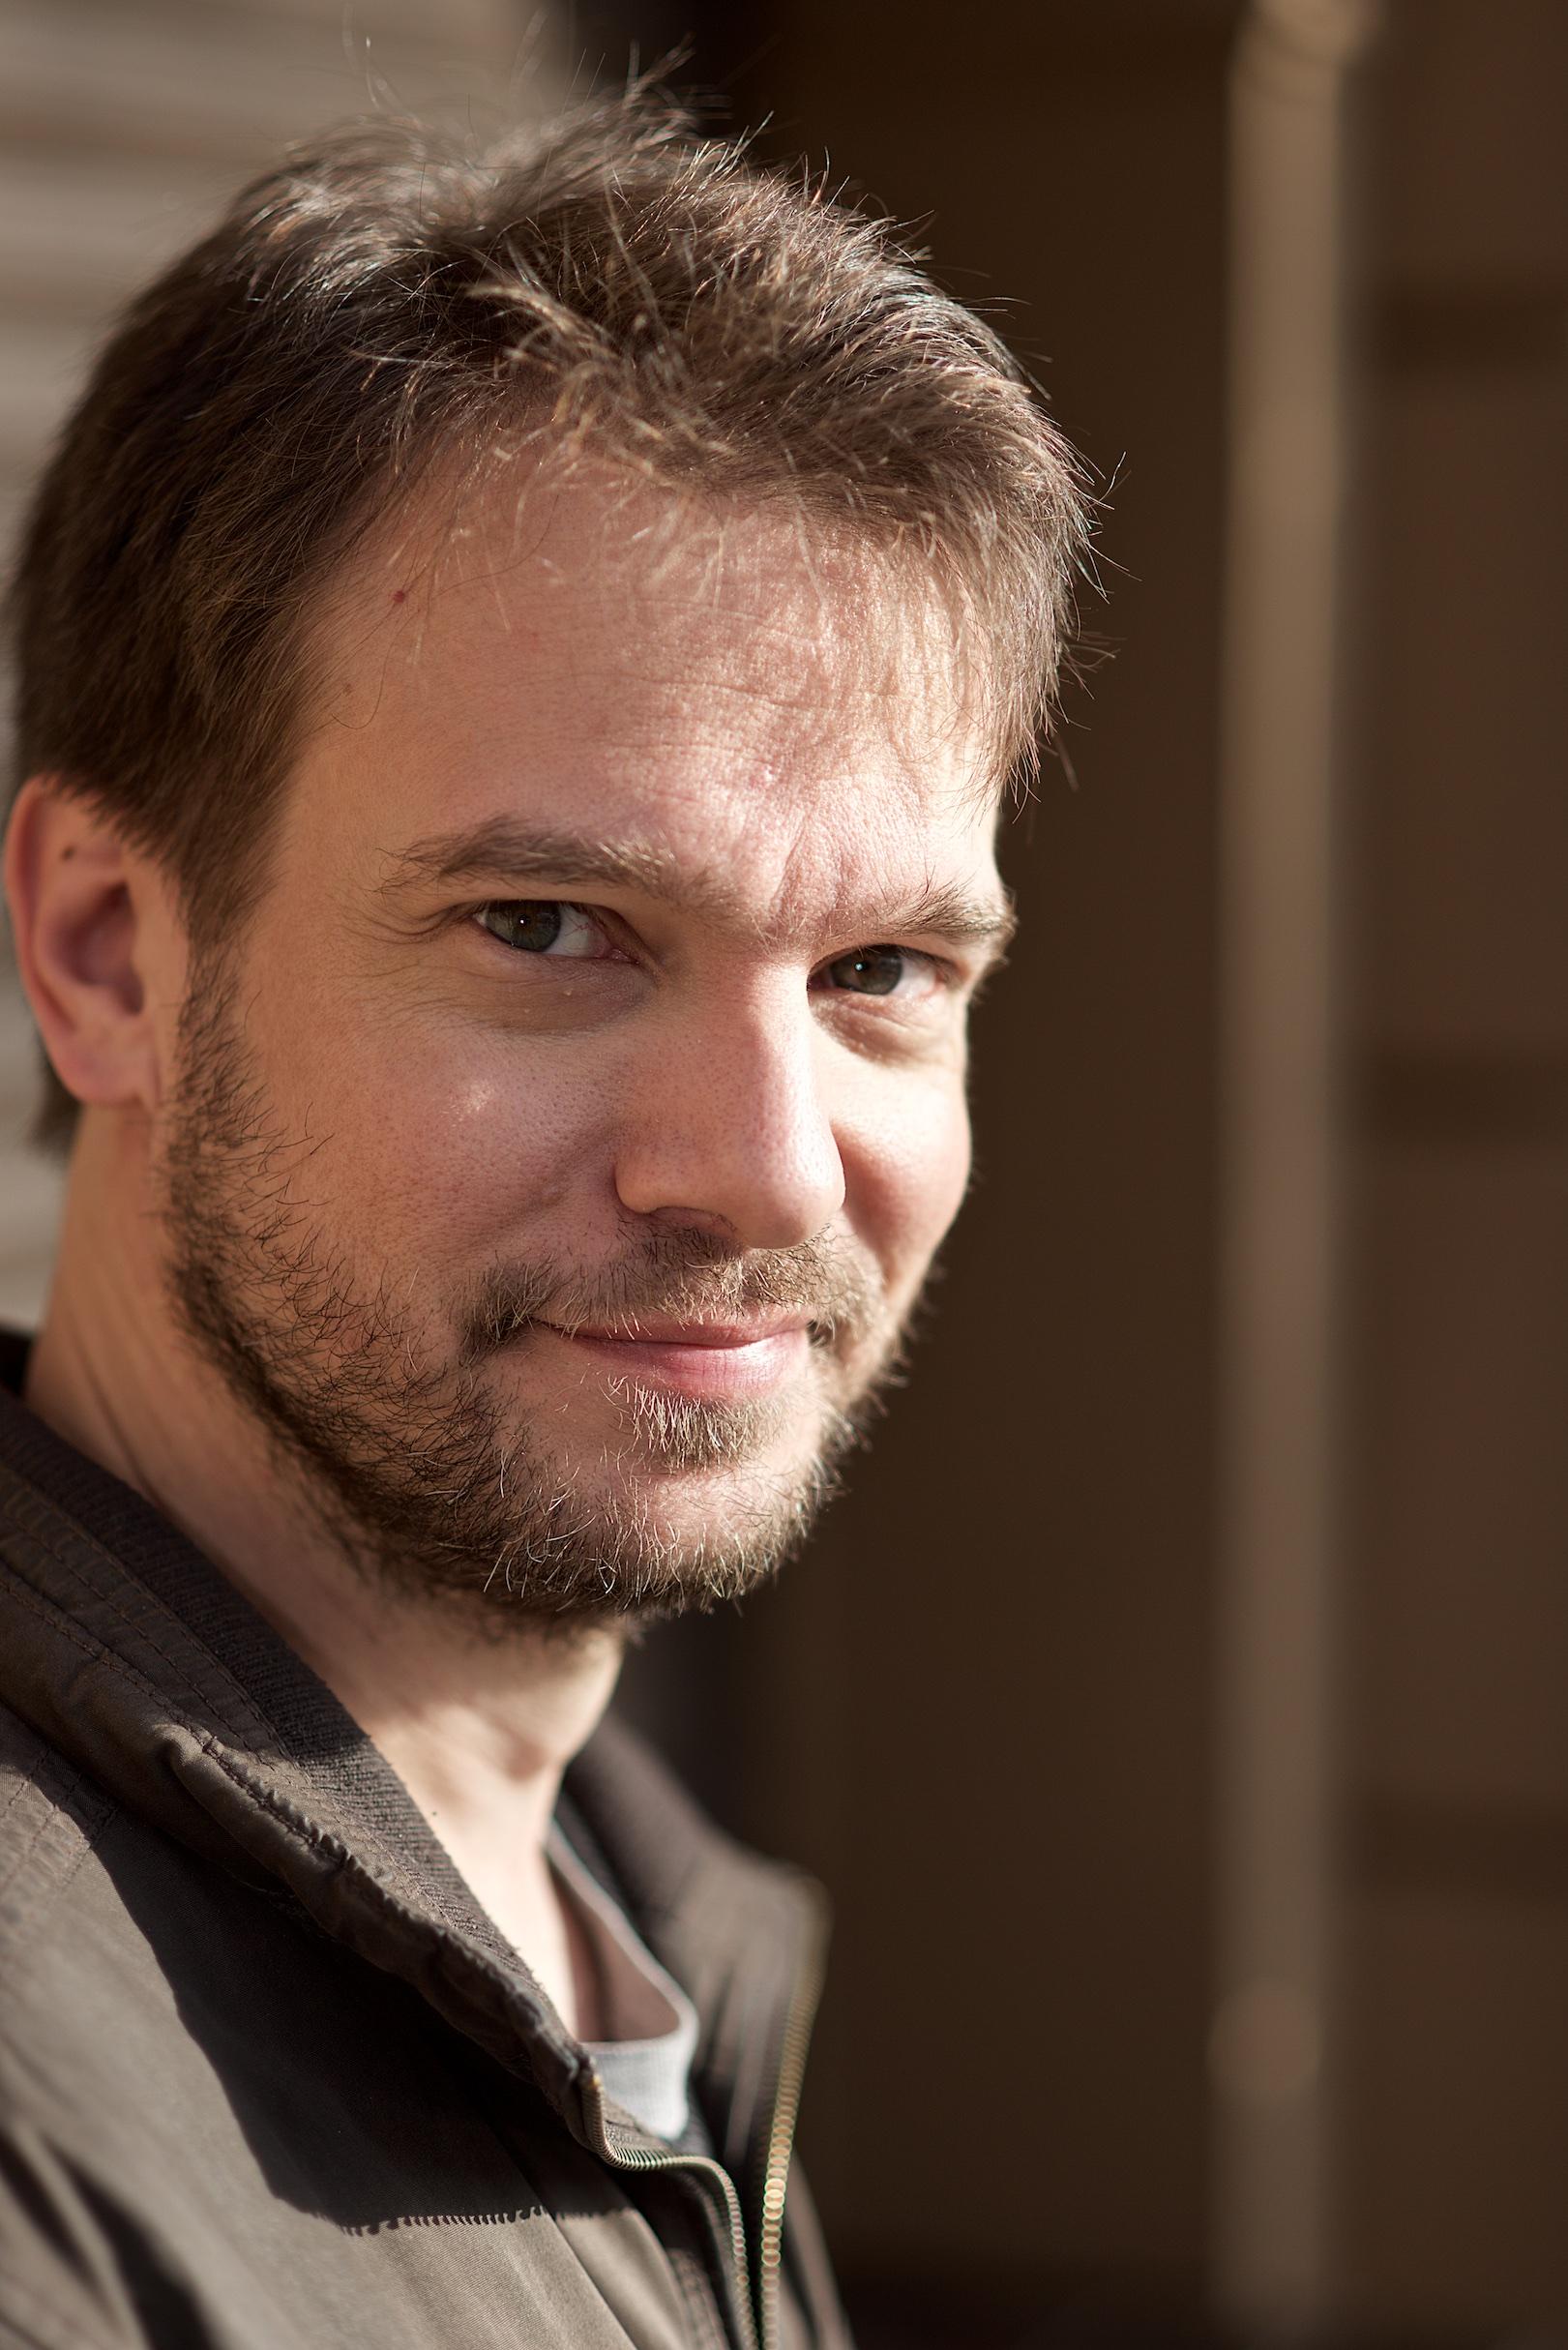 <b>Jens Baumeister</b> - Jens-Baumeister14